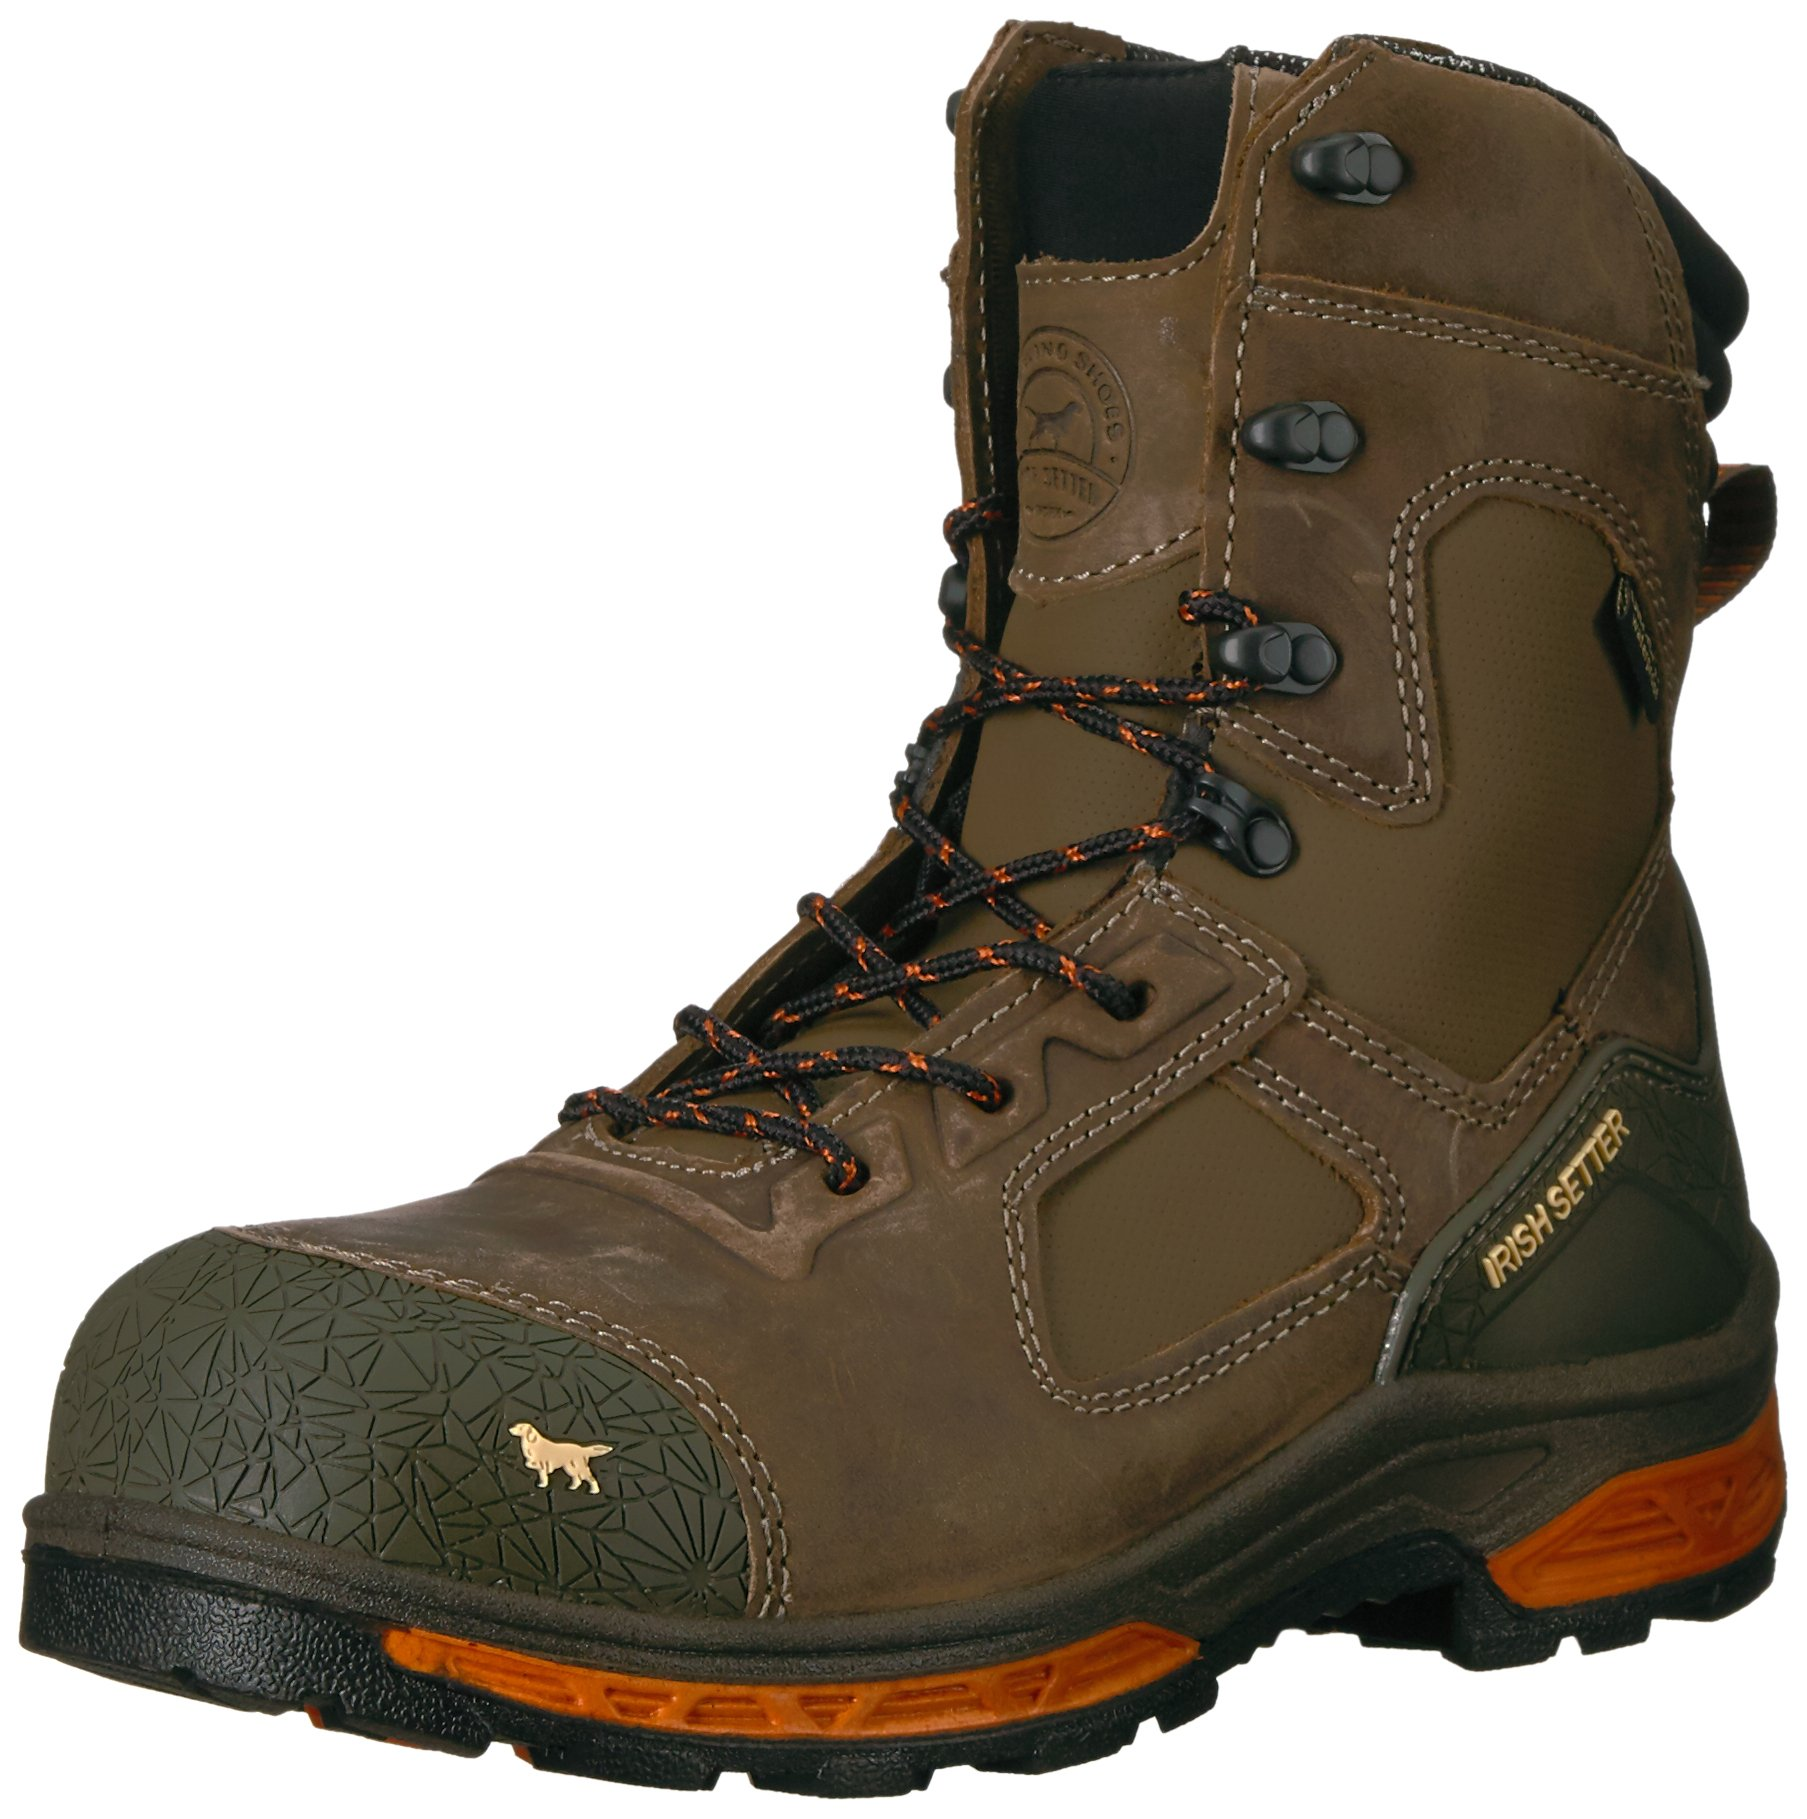 Irish Setter Work Men's Kasota 8'' Waterproof Safety Toe Work Boot, Brown, 11 D US